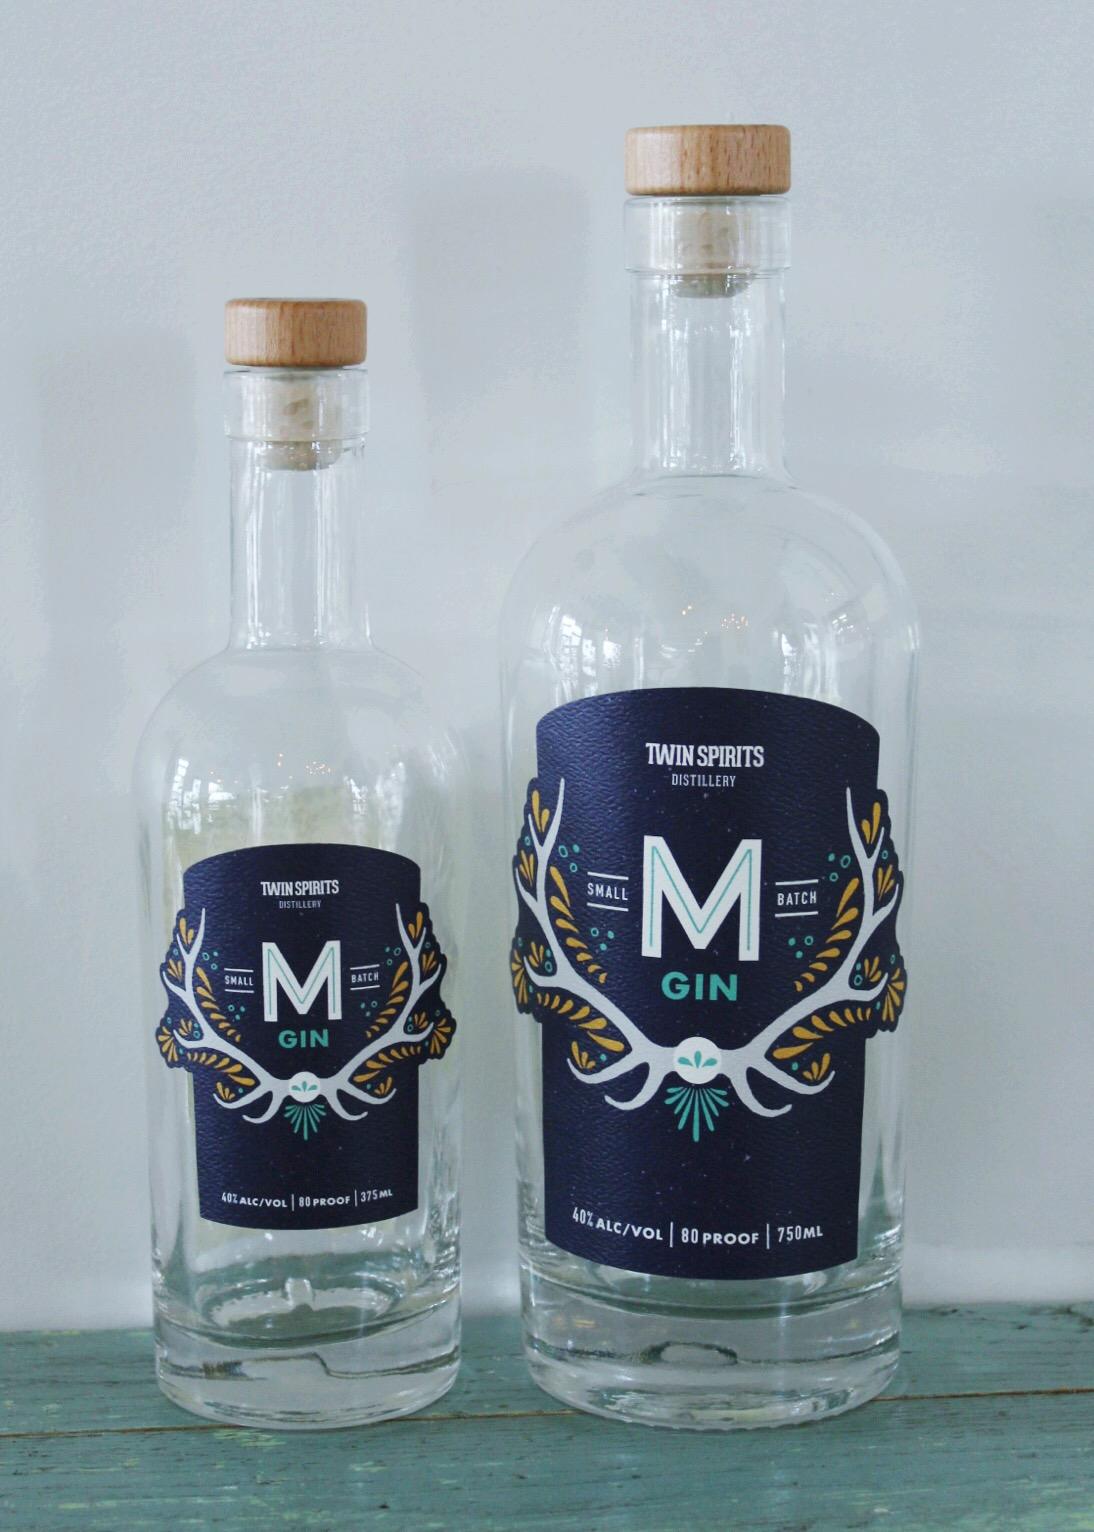 M Gin